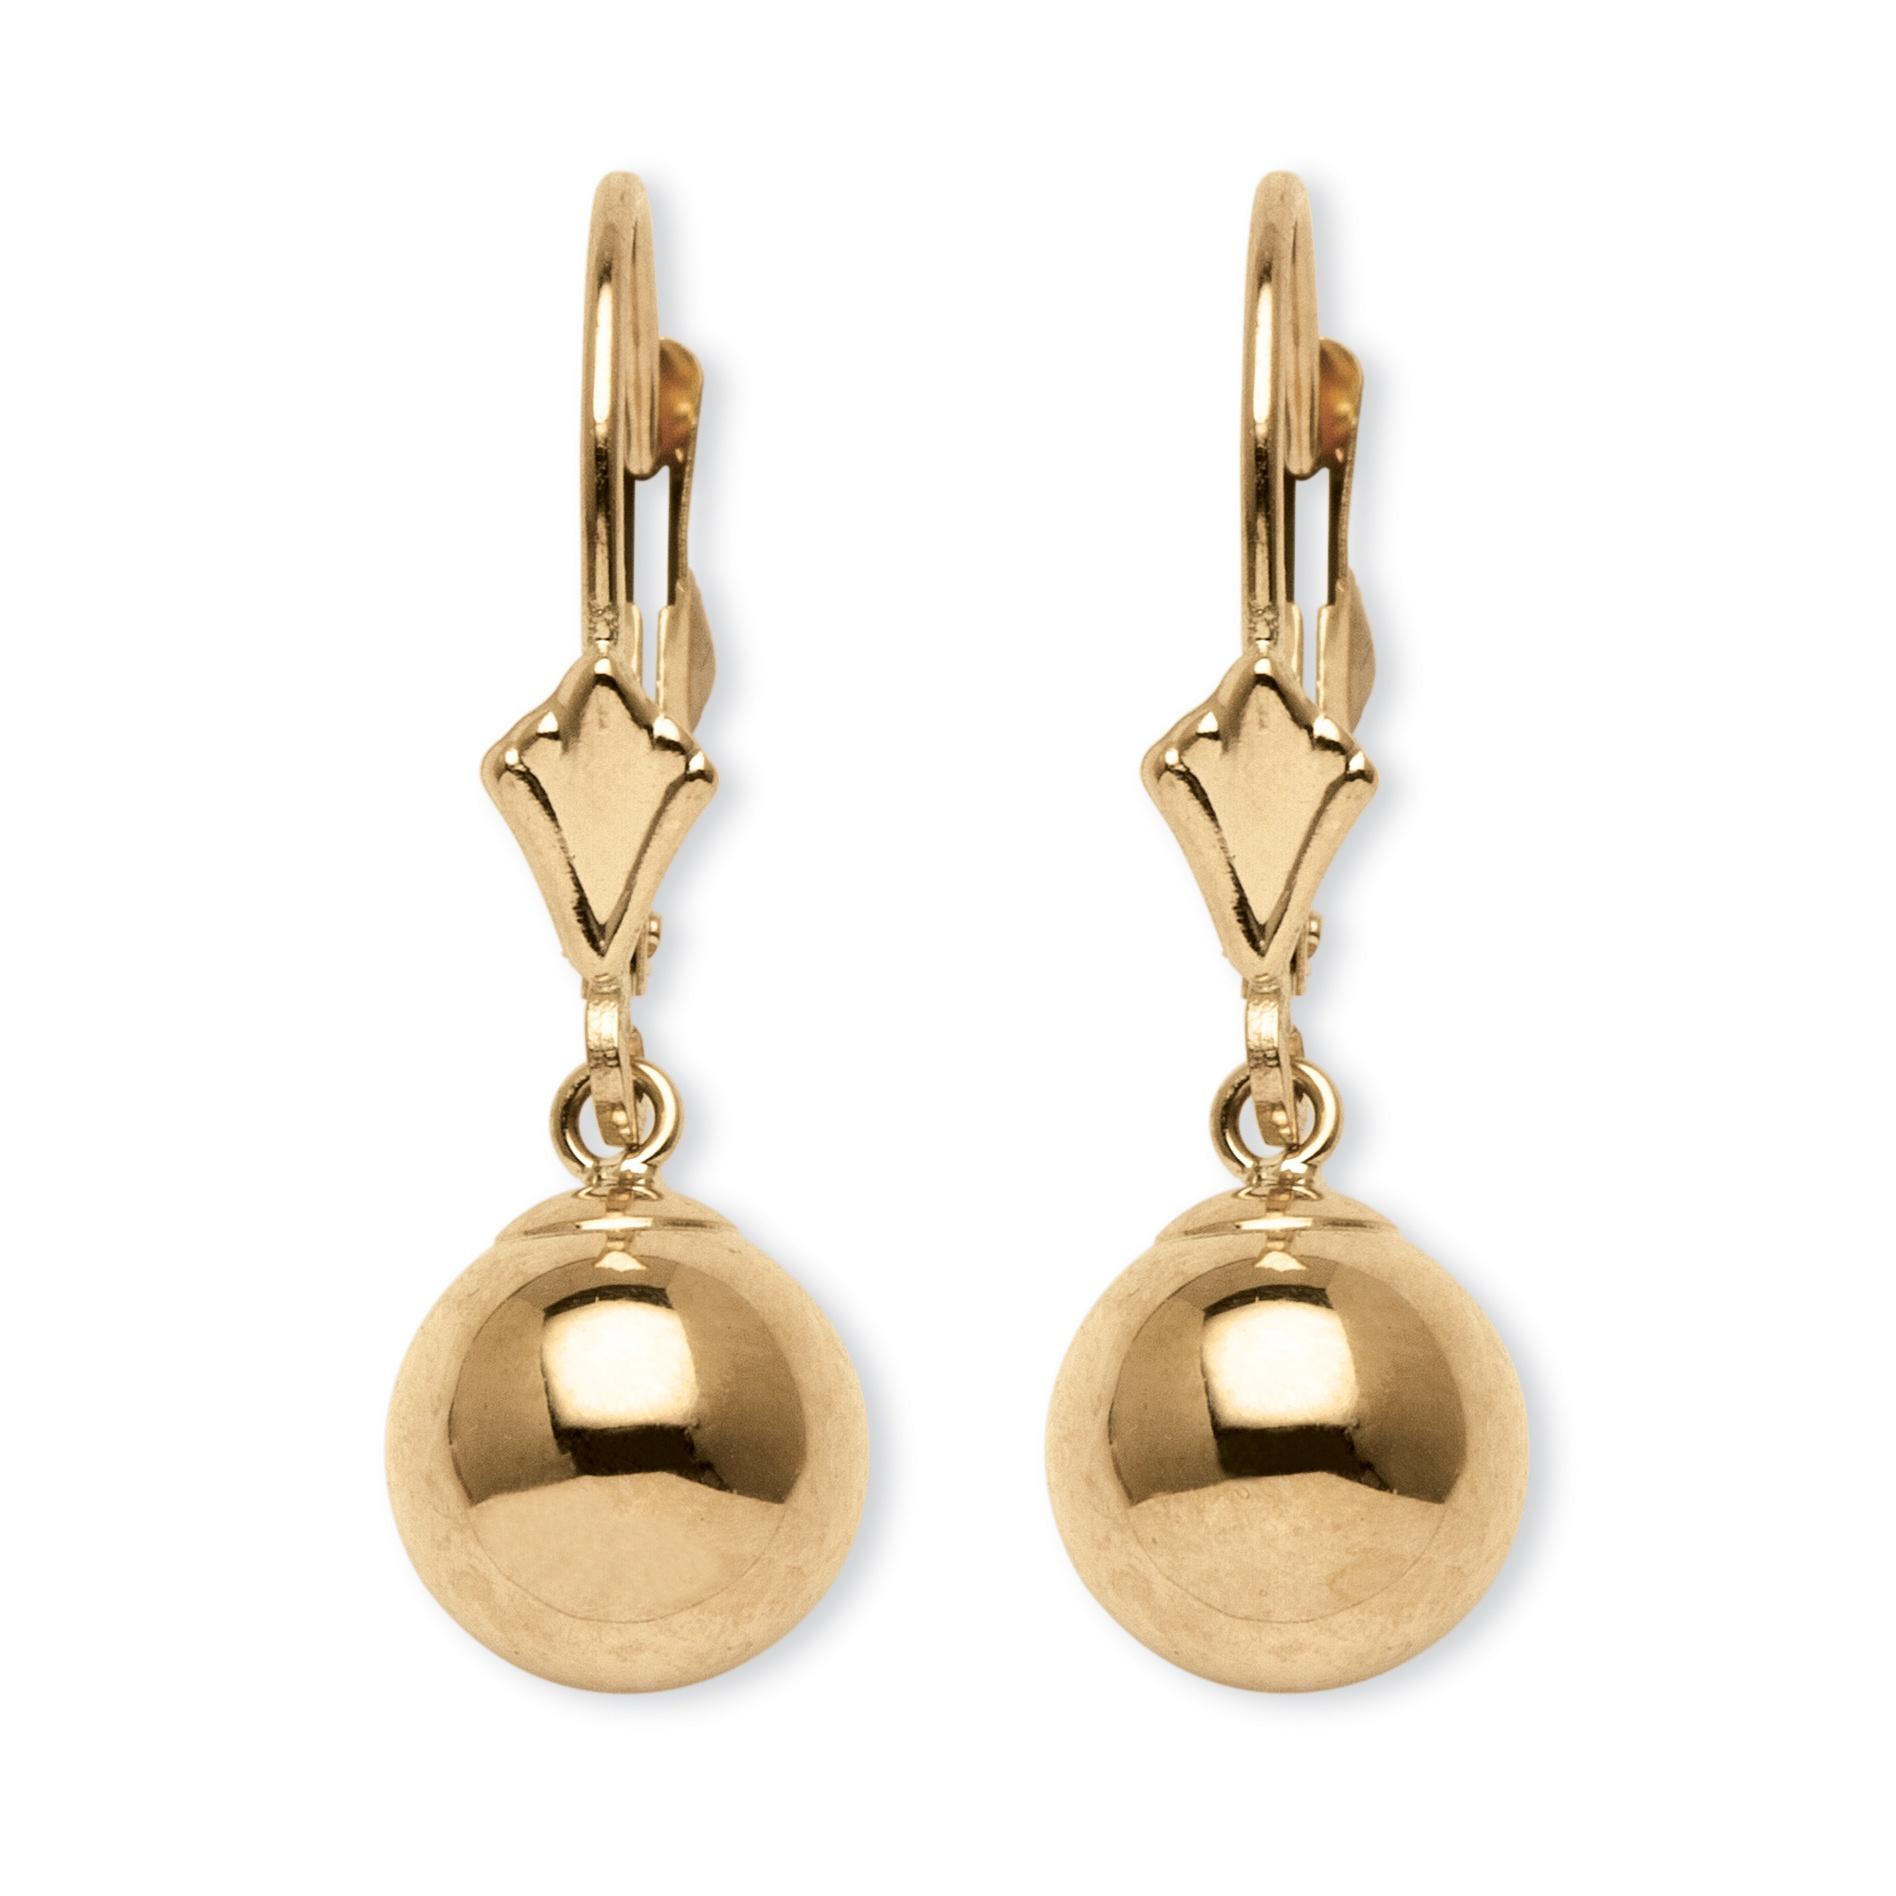 palmbeach jewelry ball drop earrings in 14k yellow gold ebay. Black Bedroom Furniture Sets. Home Design Ideas